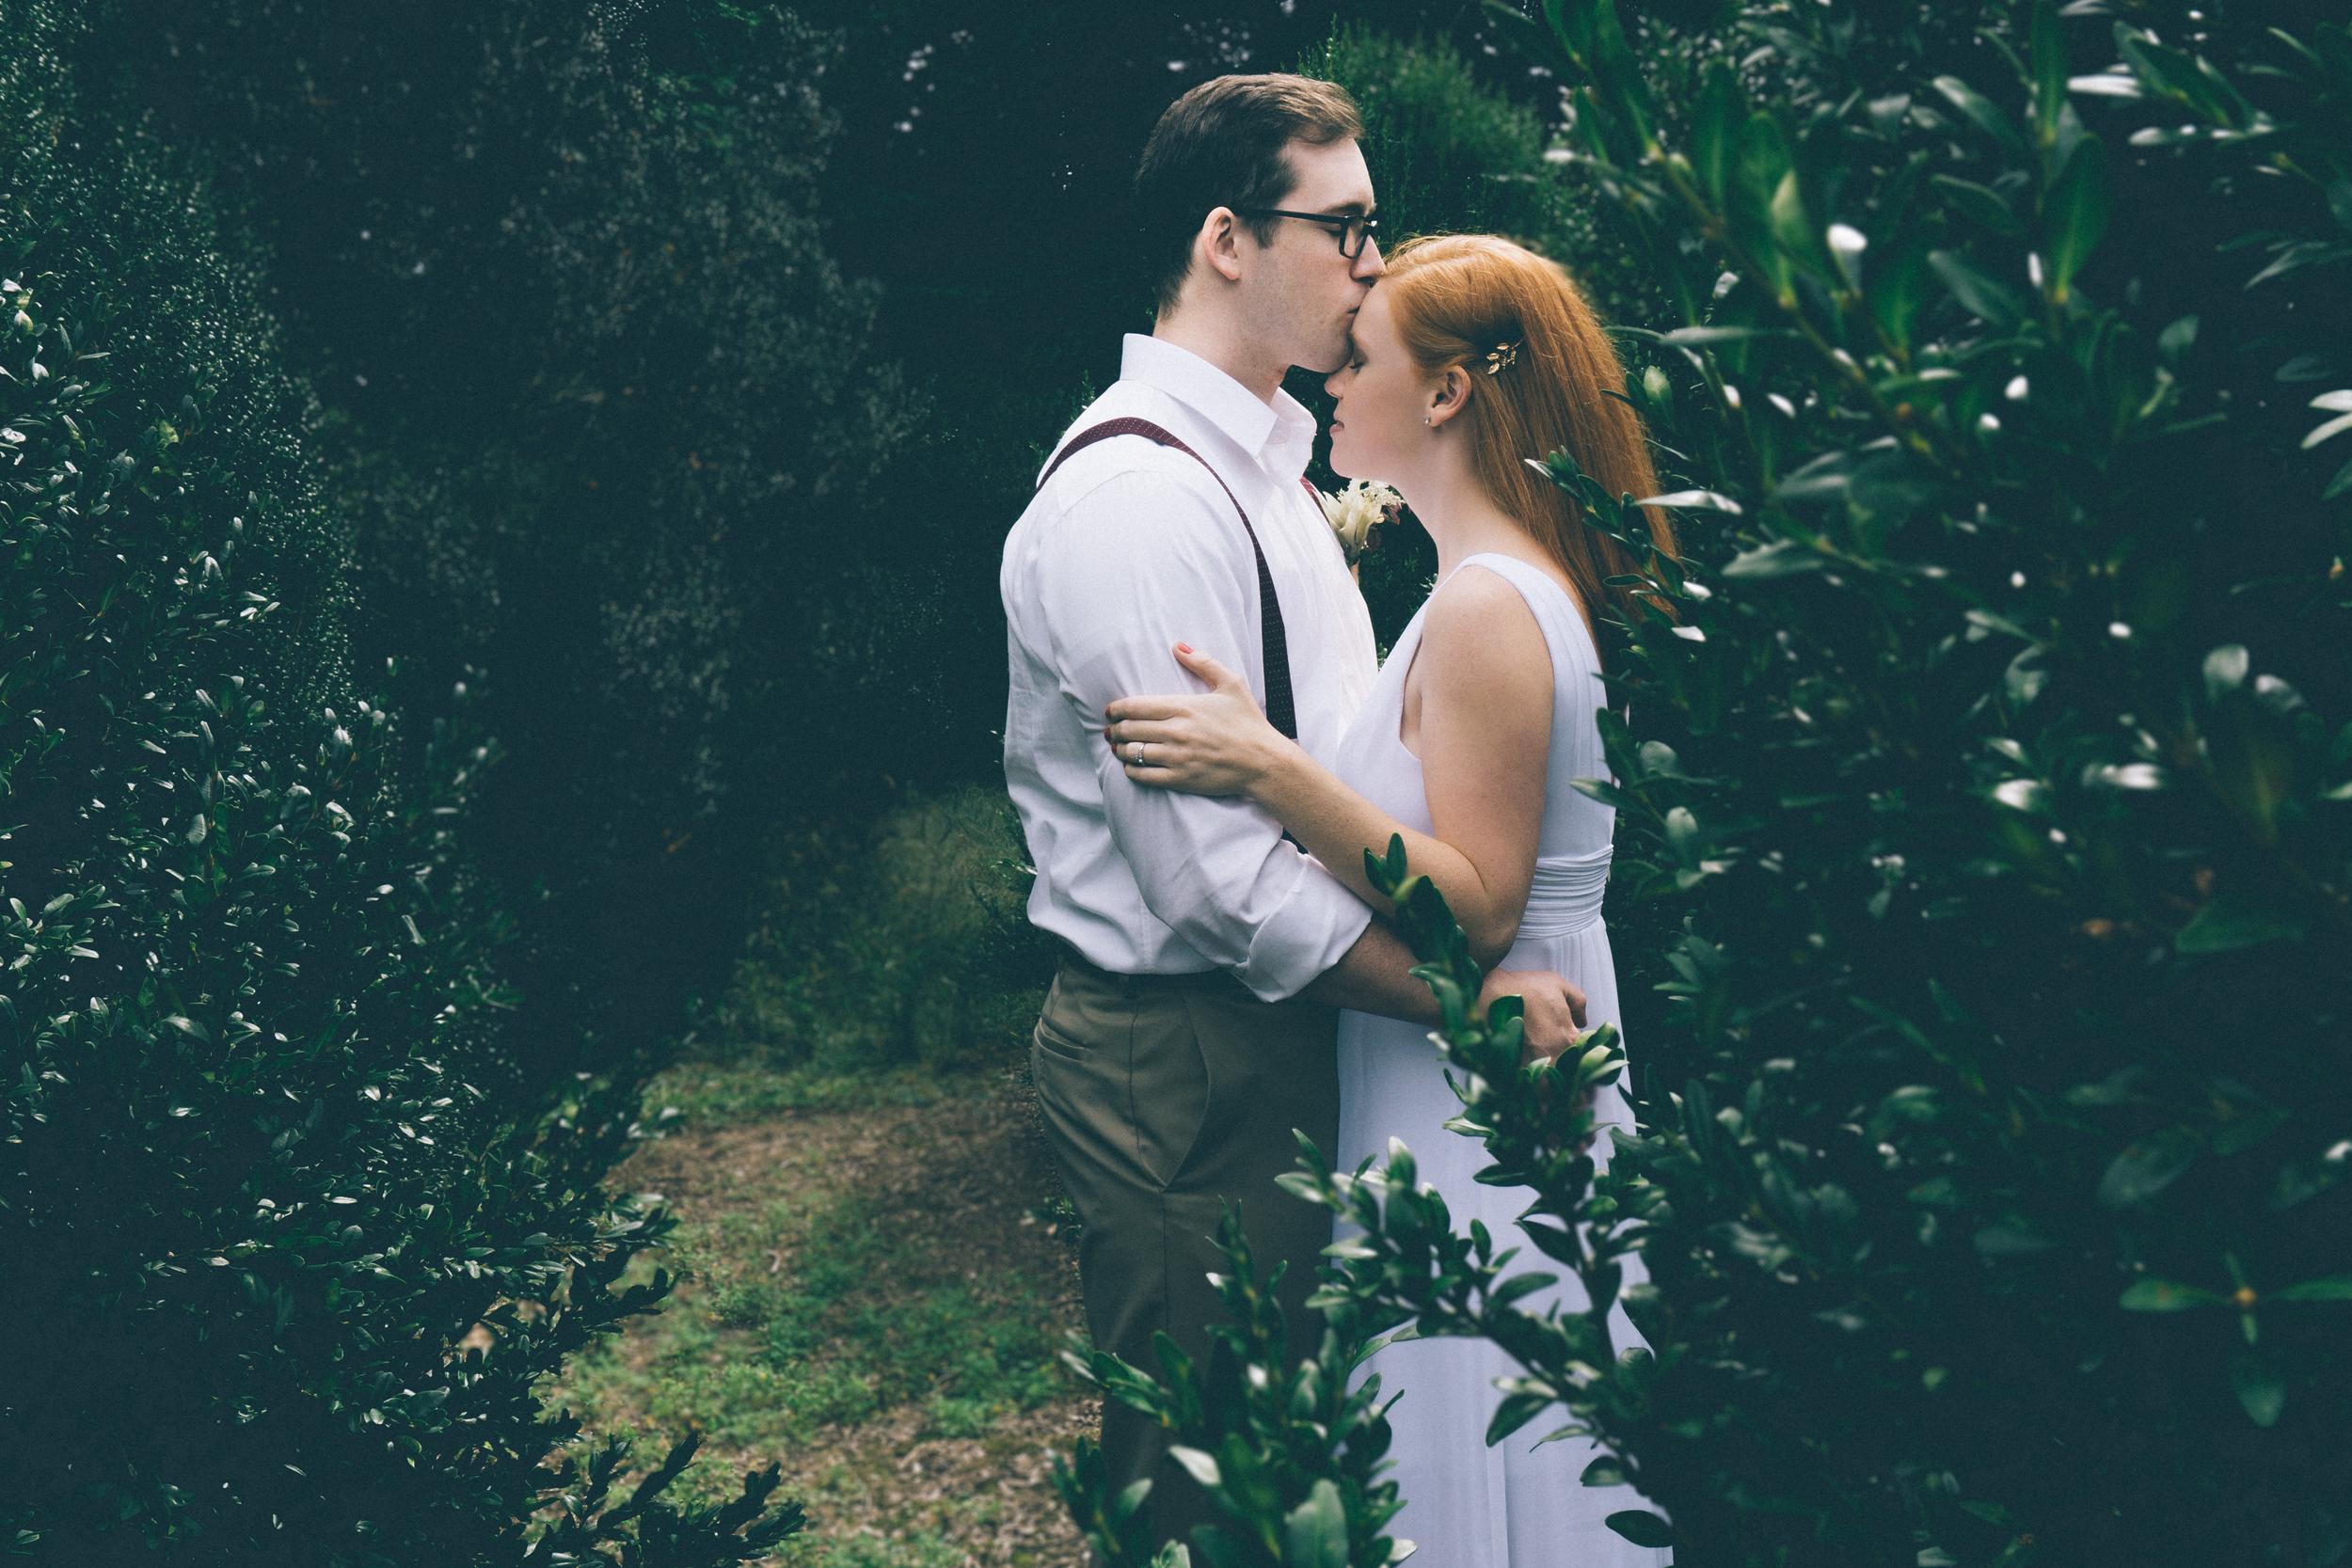 woodland_wedding_taneisha_marie_photography-20.jpg